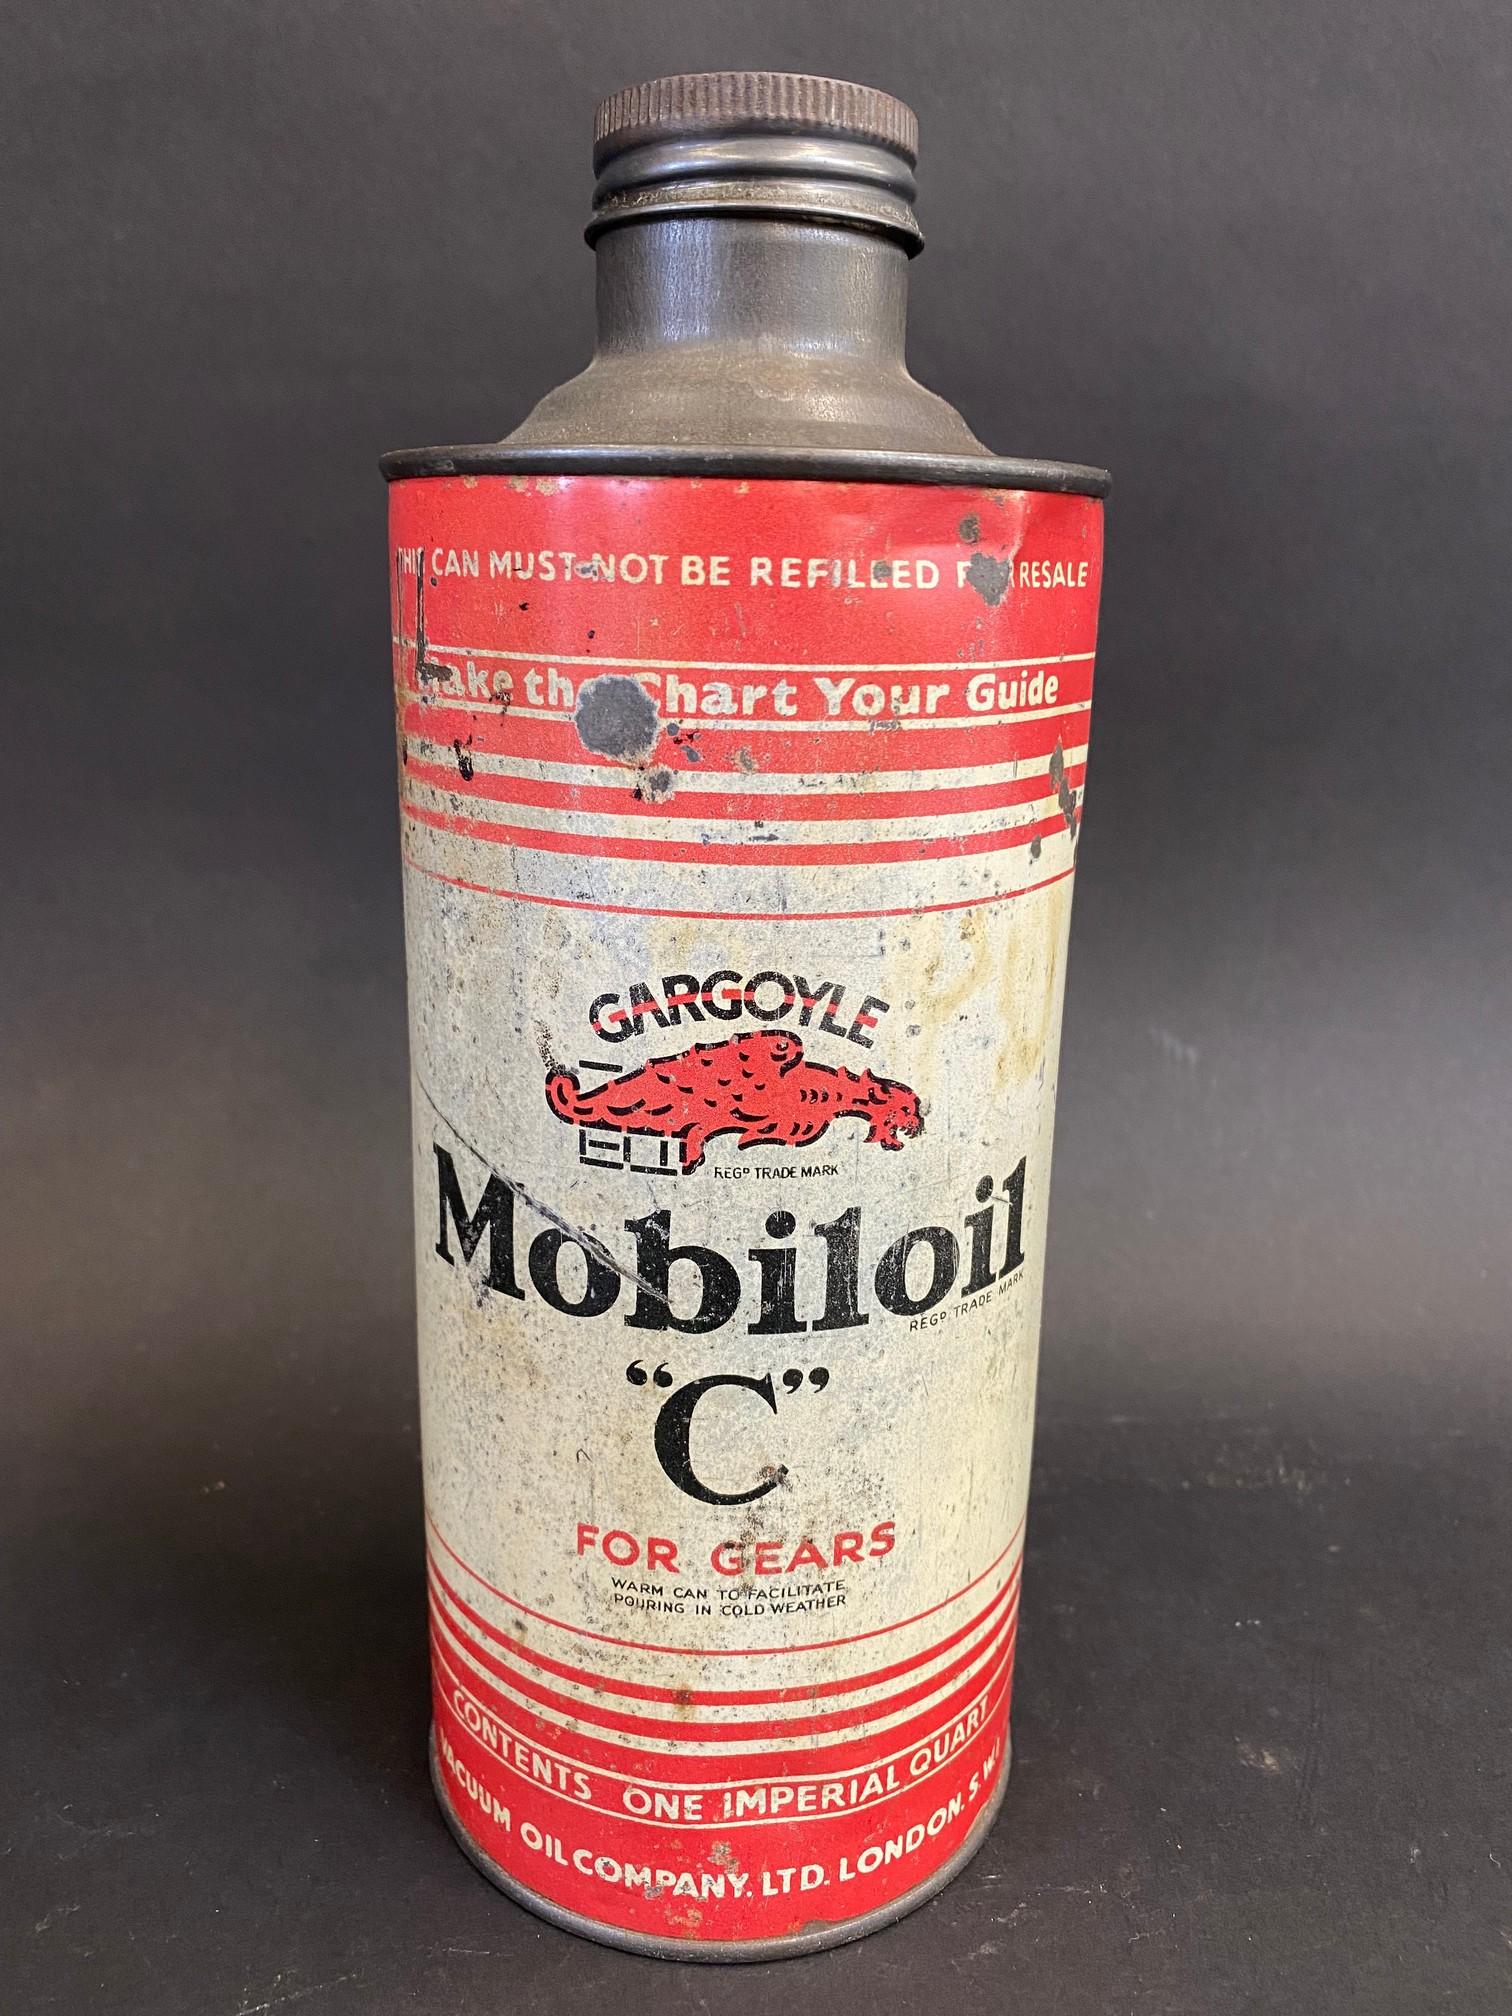 A Gargoyle Mobiloil 'C' for gears cylindrical quart oil can.